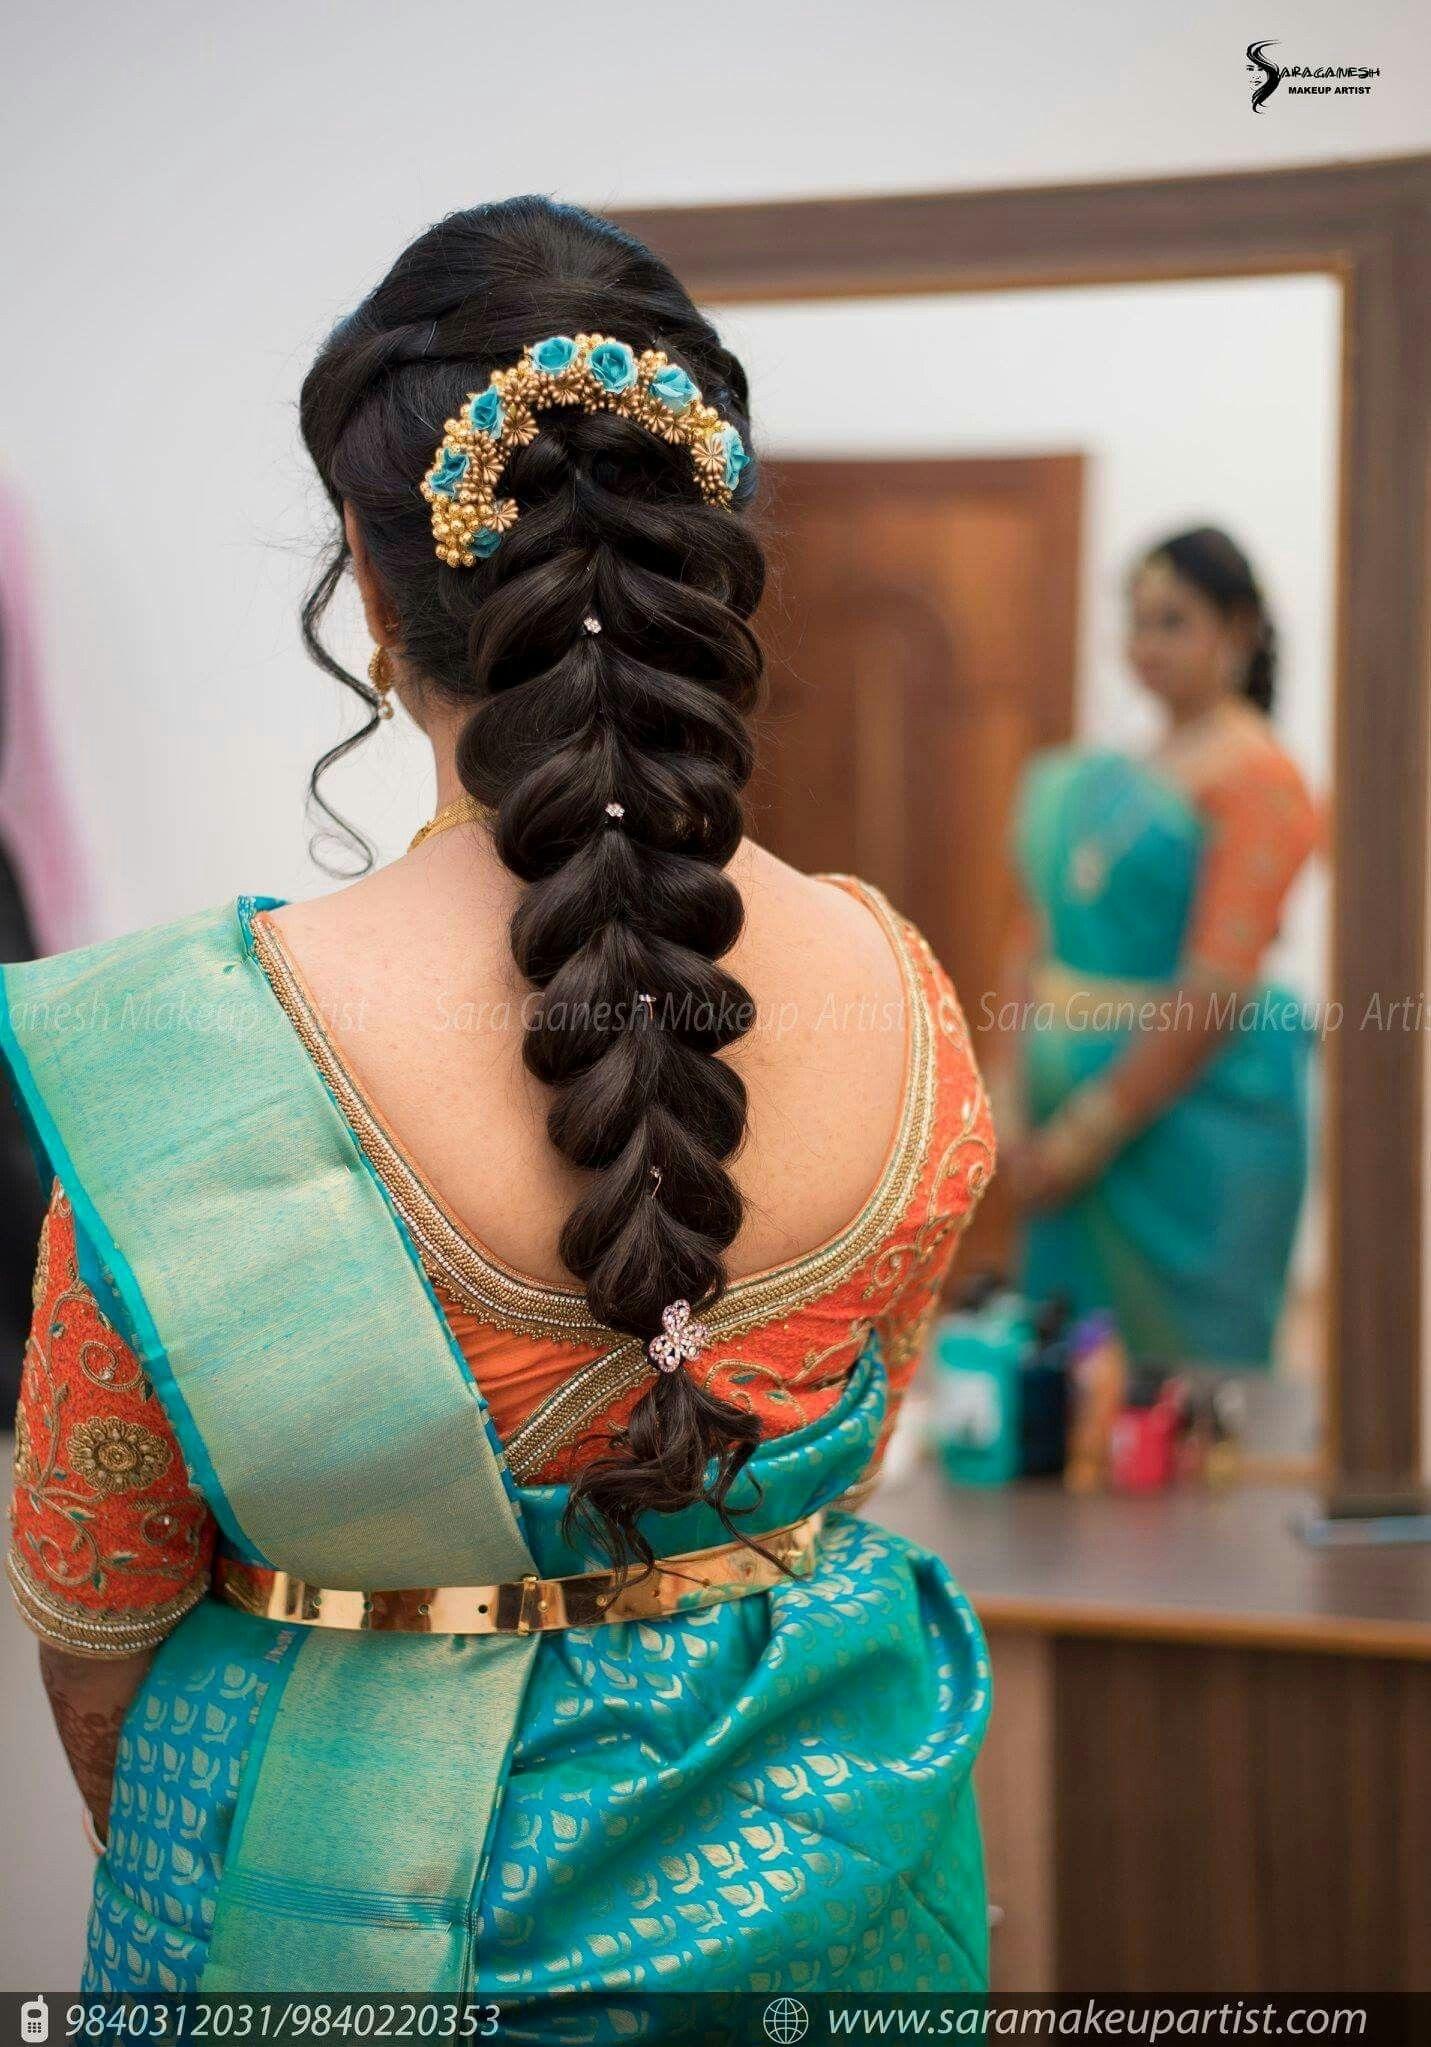 Hair Do | Hair Do | Indian Wedding Hairstyles, Wedding with regard to Indian Wedding Hairstyles With Flowers For Long Hair